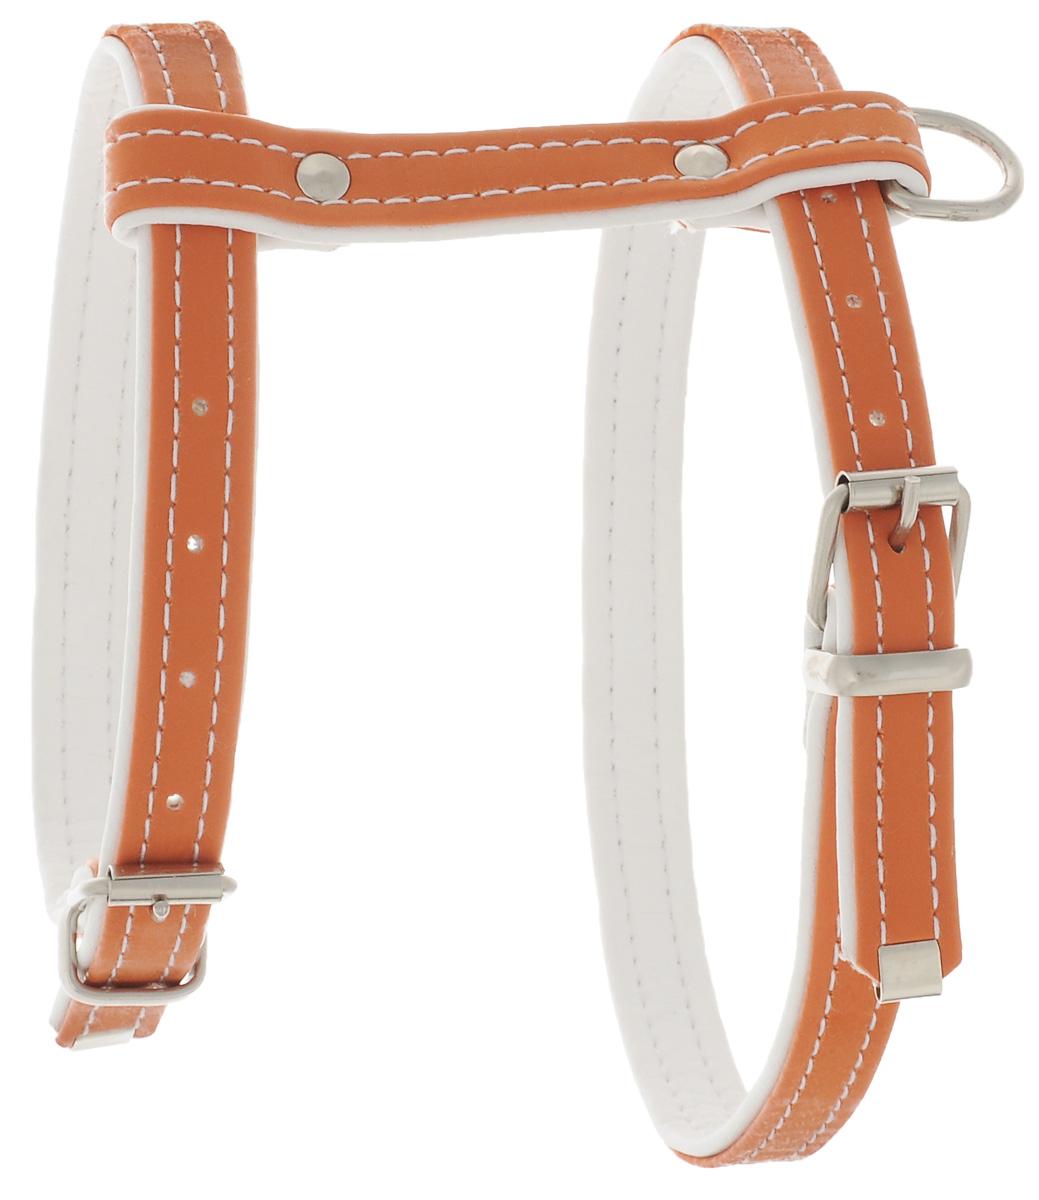 Шлейка Аркон Техно, цвет: оранжевый, белый, ширина 1,5 см, длина 10 см шлейка для собак аркон стандарт 2 водильная цвет бежевый обхват груди 80 98 см